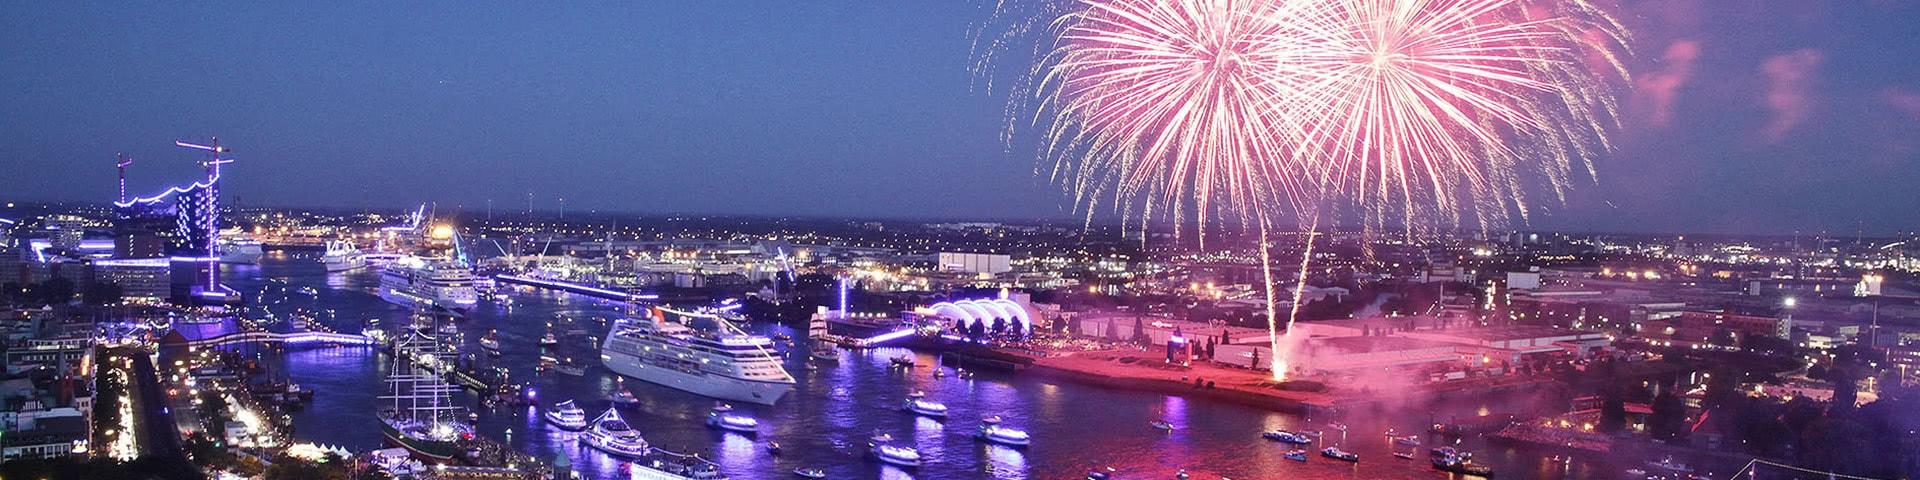 Großes Feuerwerk beim Hamburger Hafengeburtstag